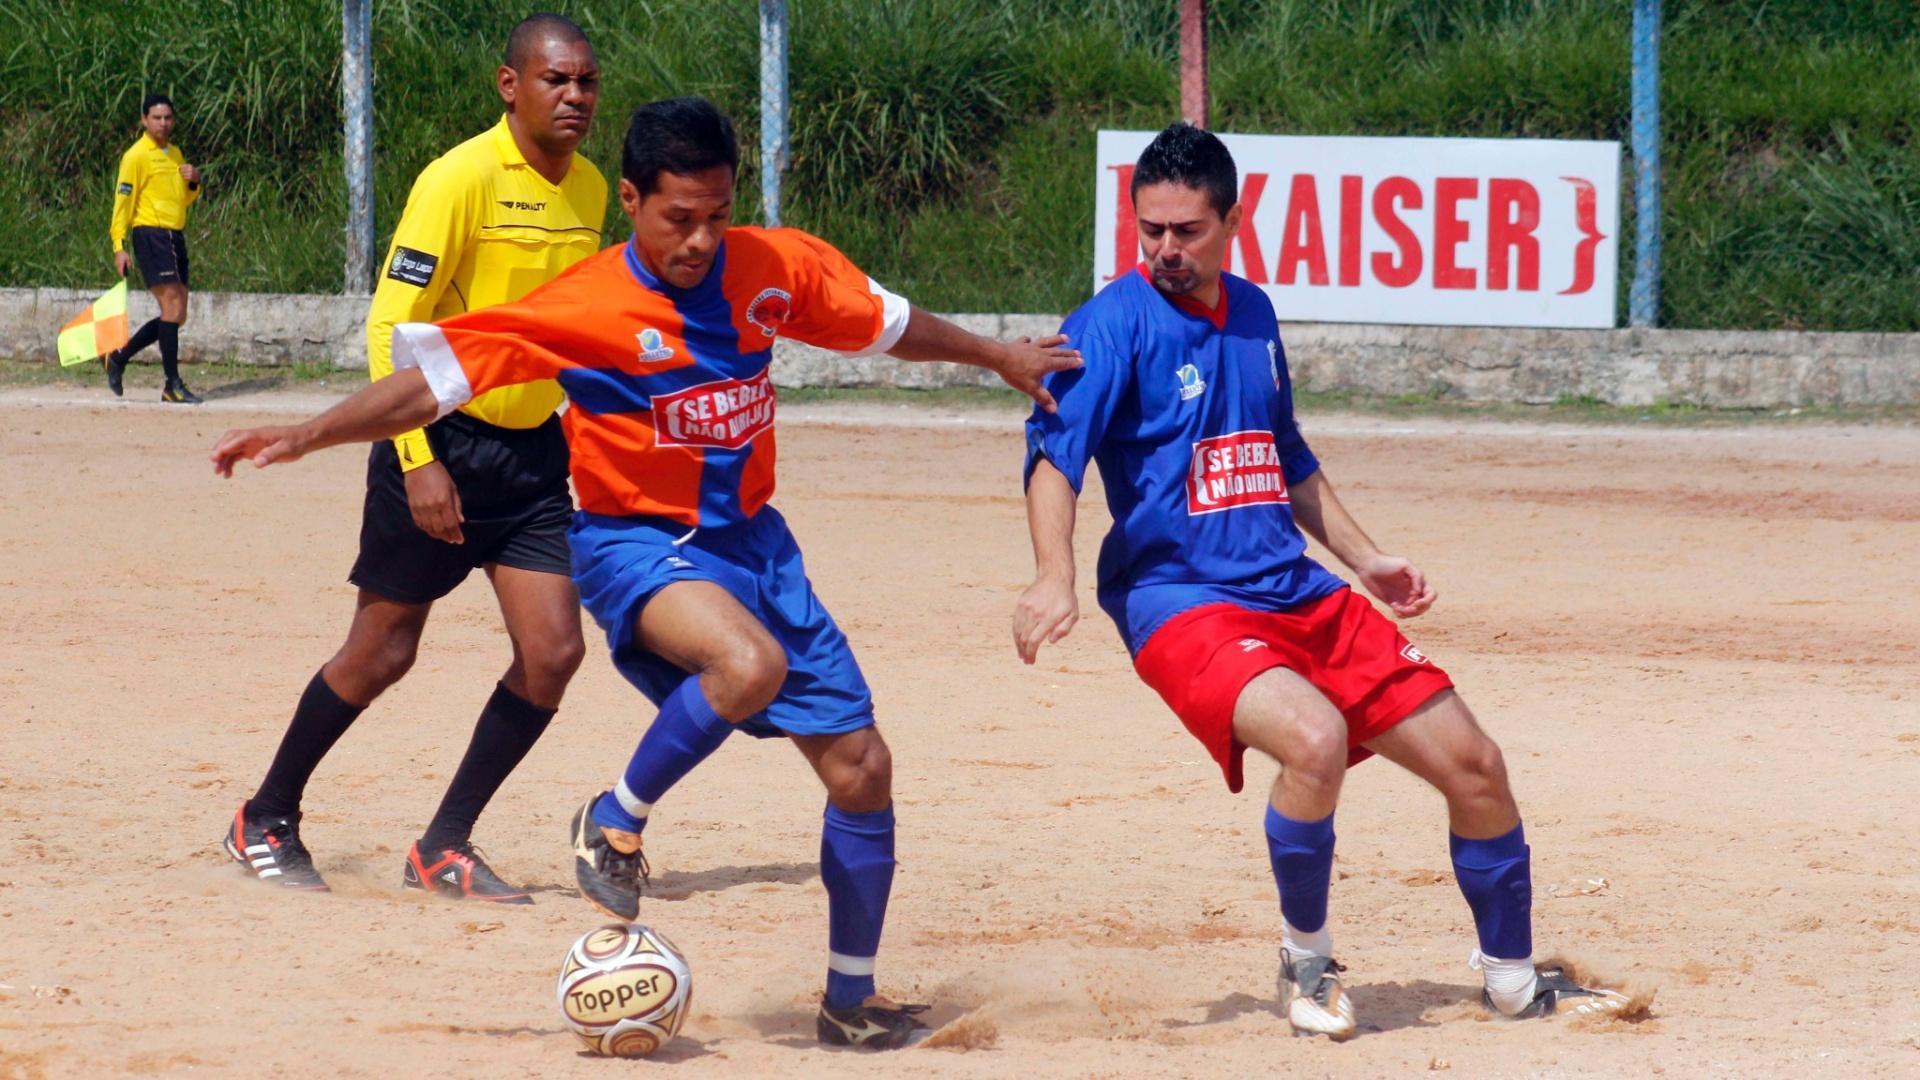 Tabajara (laranja) e Americano (azul) fizeram jogo duro